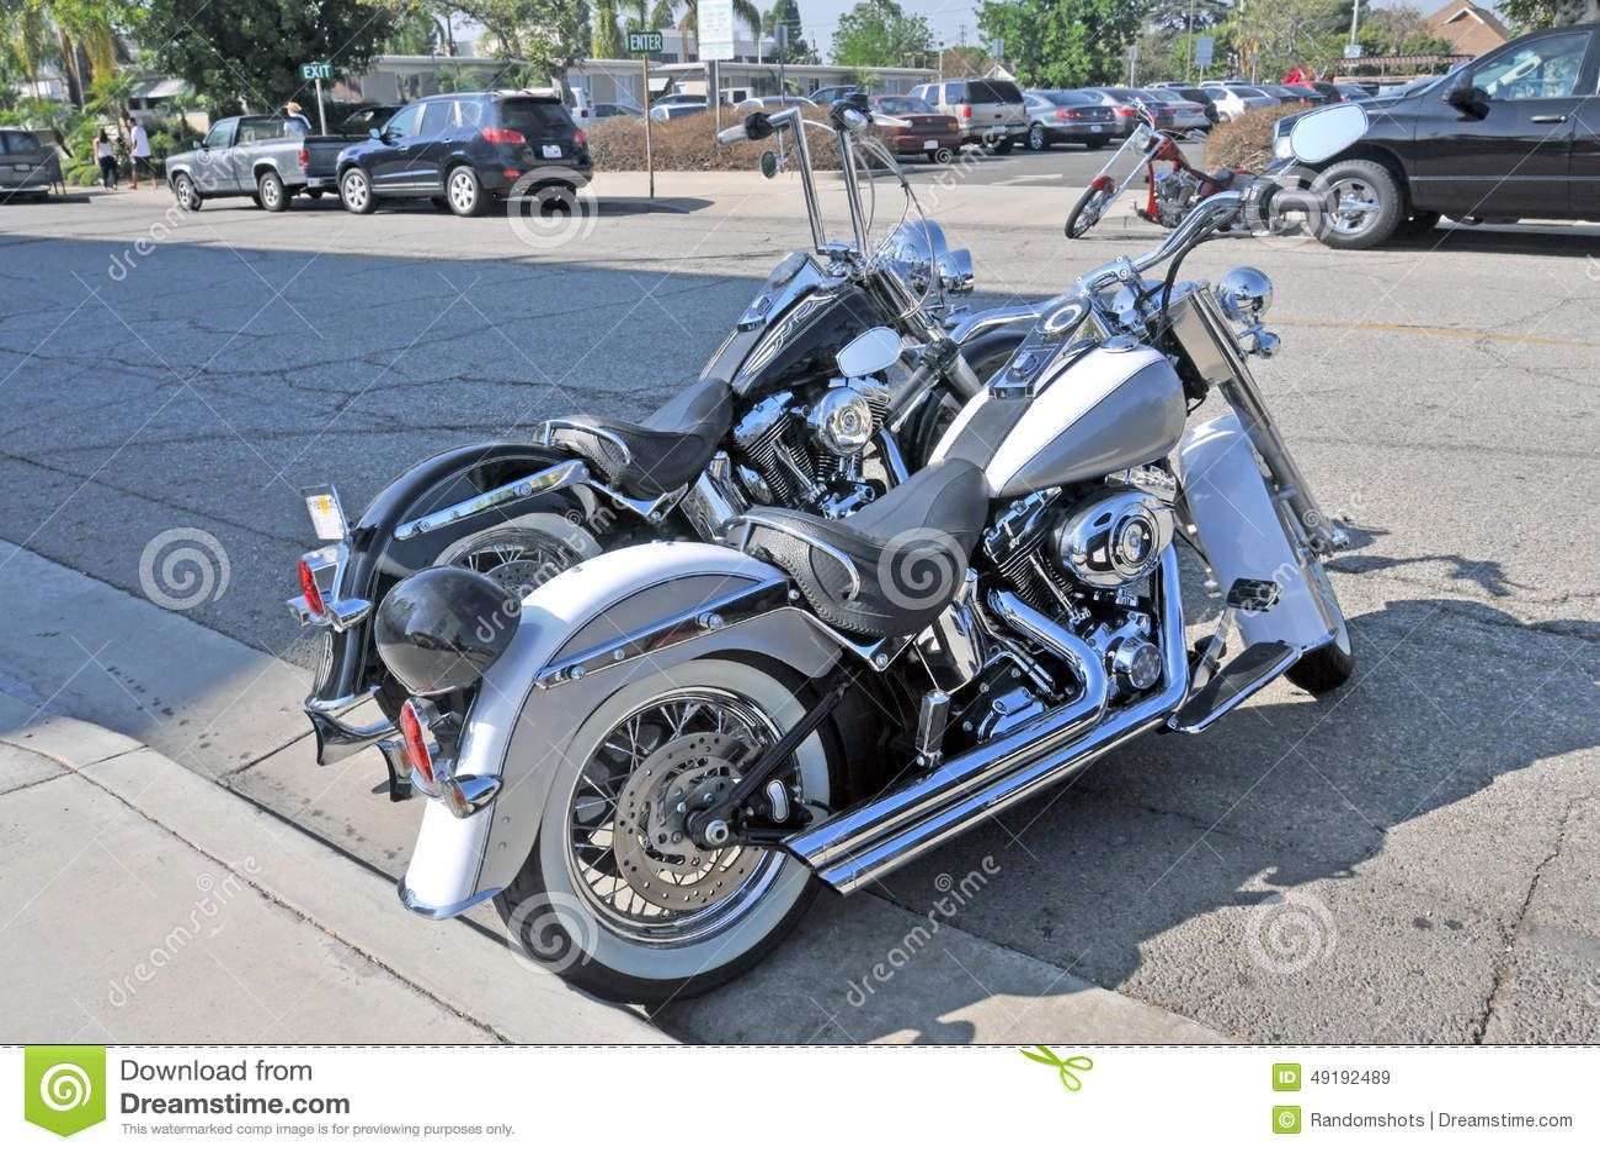 harleys and a chopper editorial stock image image 49192489. Black Bedroom Furniture Sets. Home Design Ideas